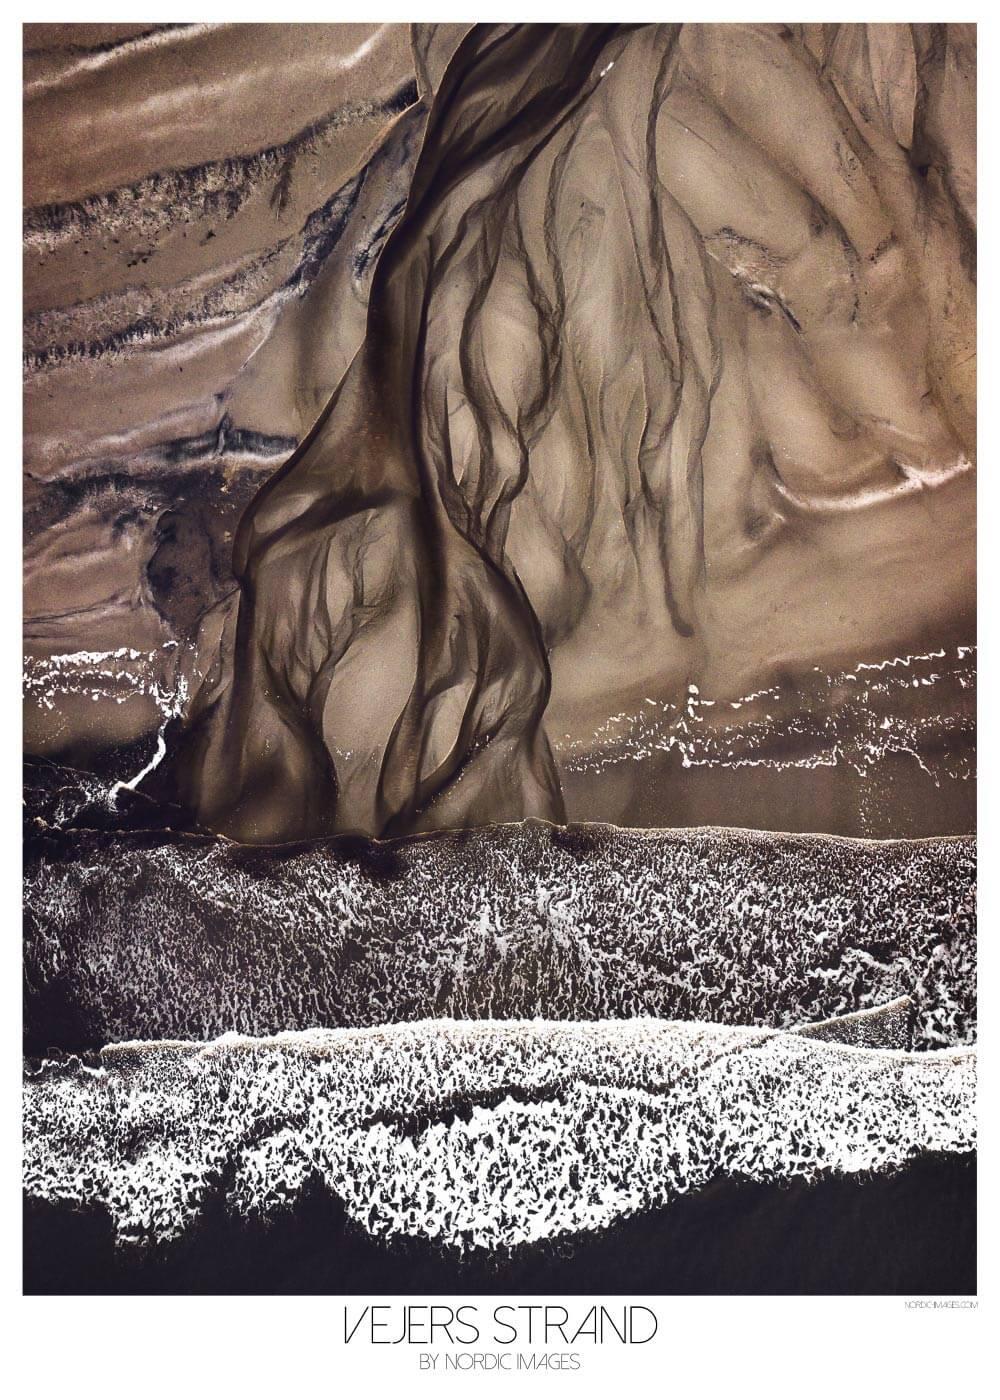 Billede af Vejers strand - Brian Lichtenstein plakat